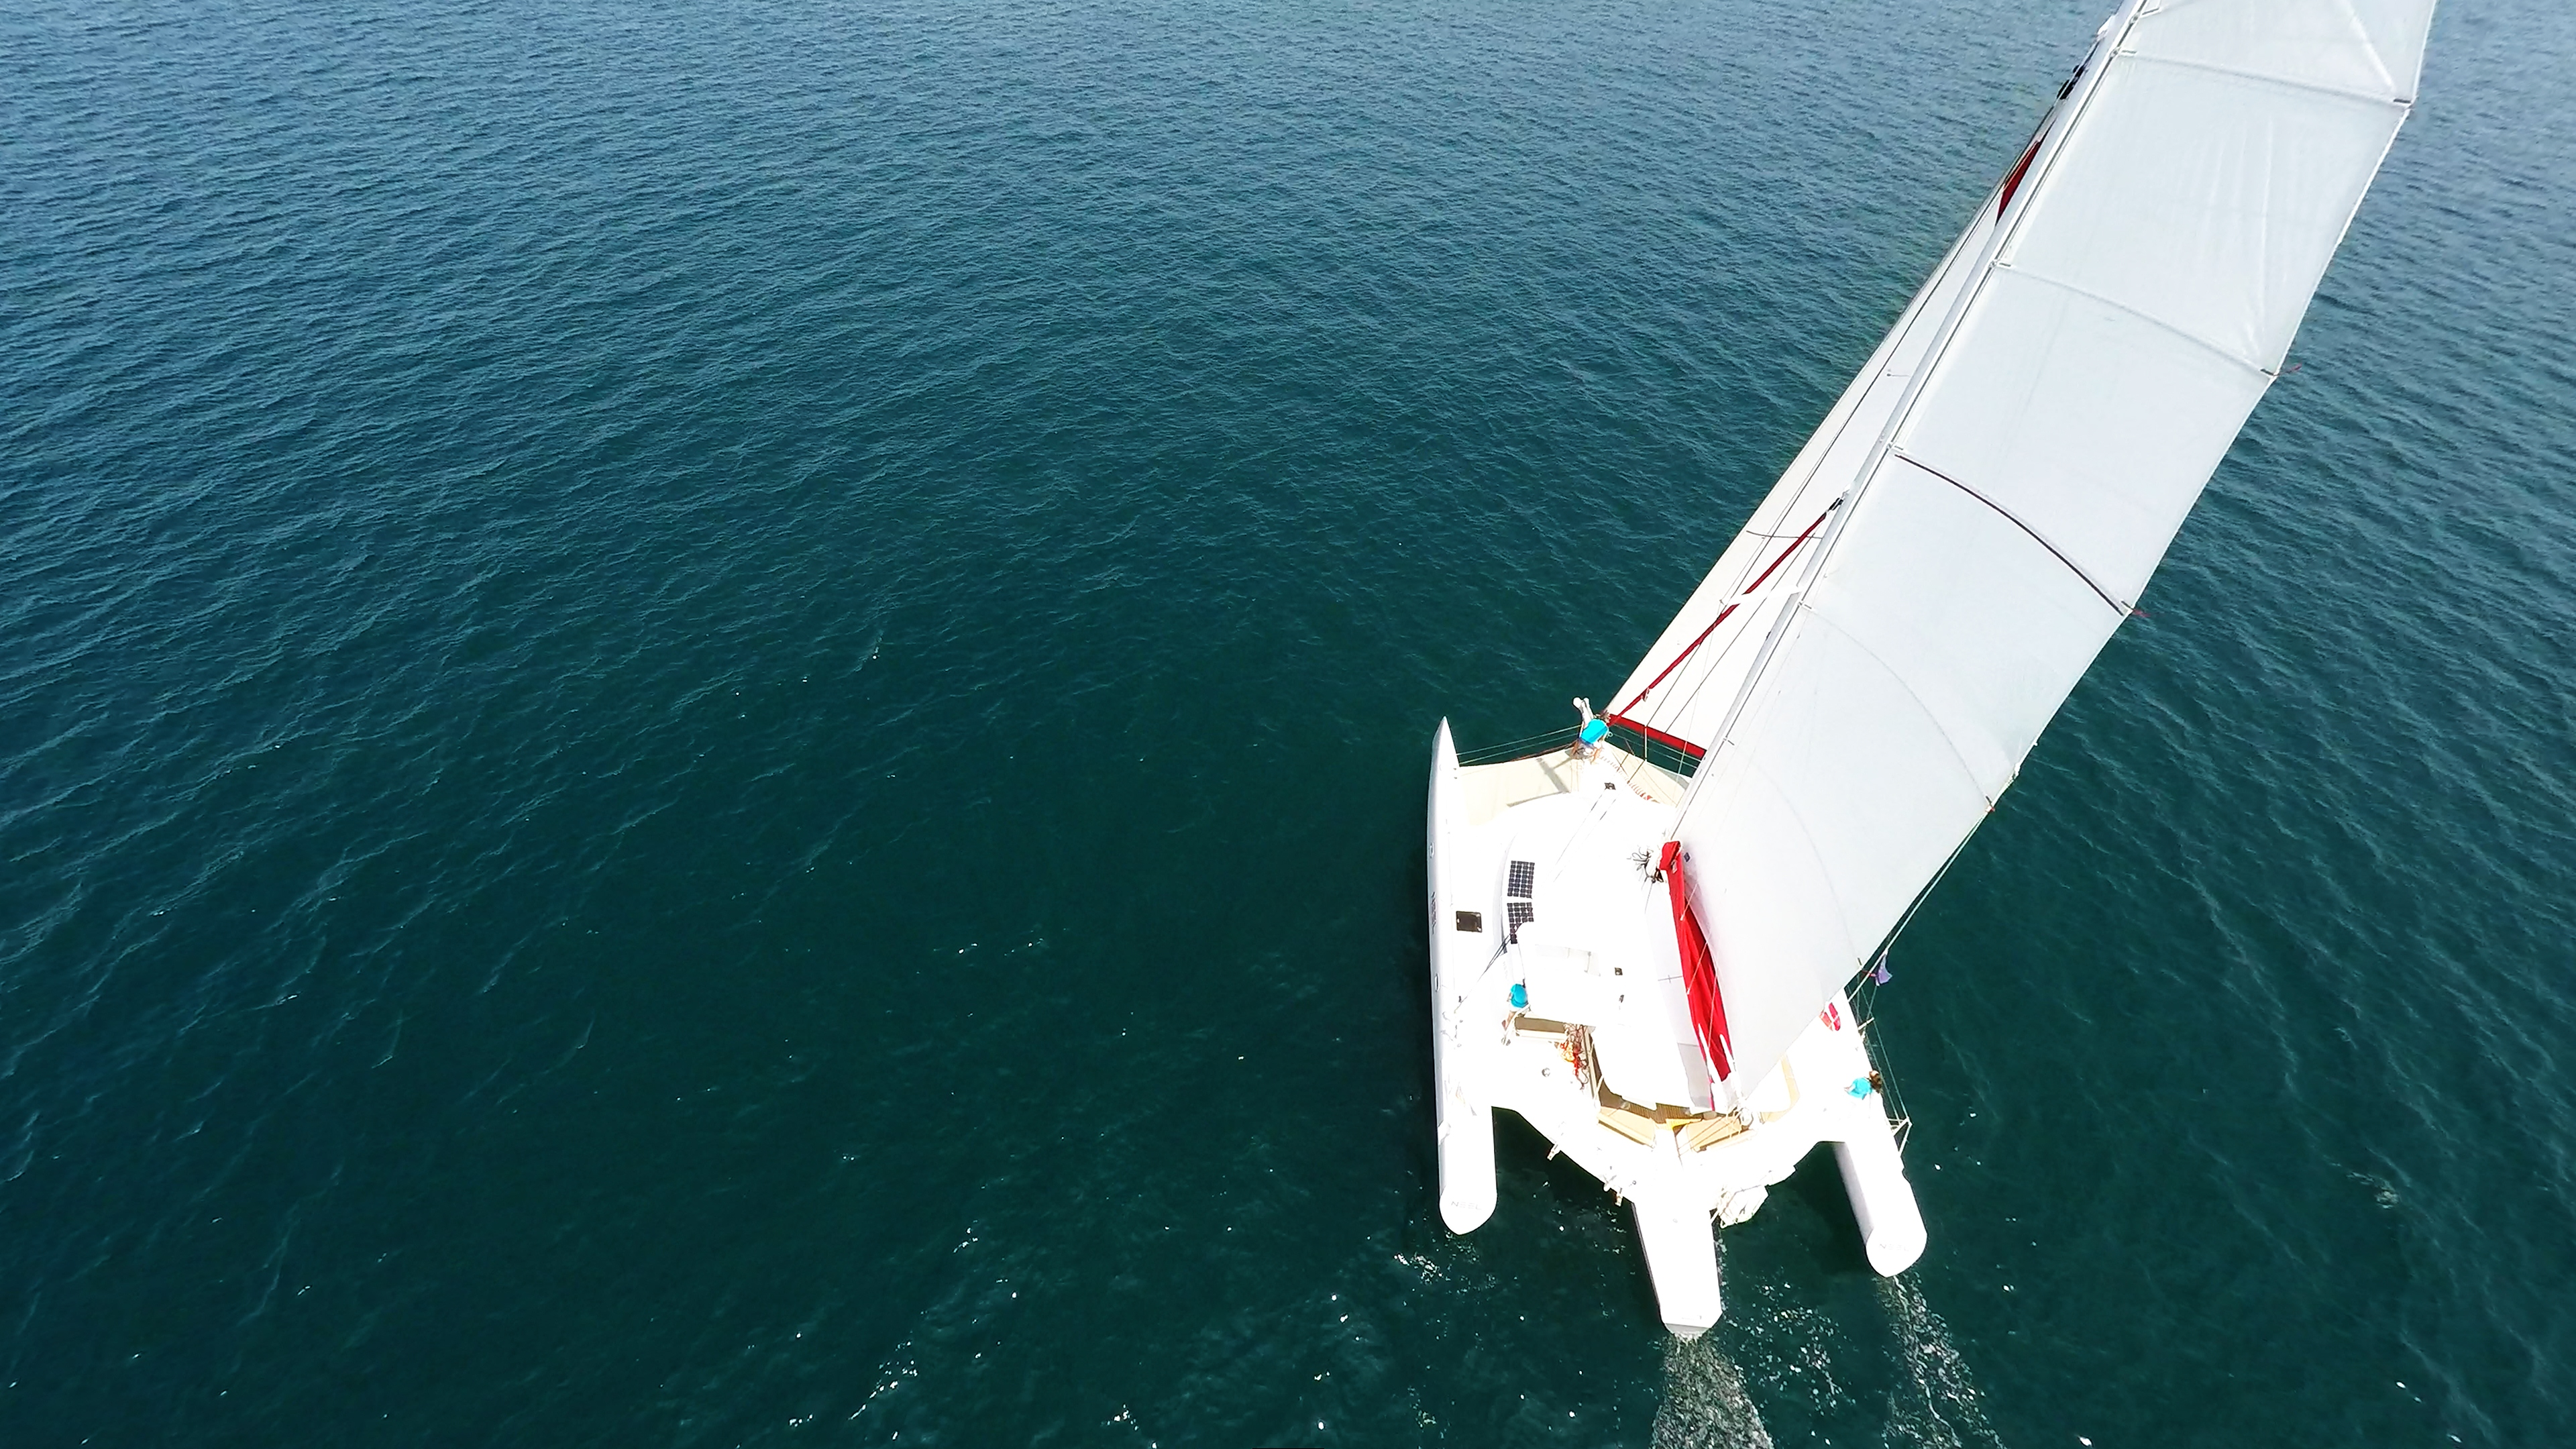 yachting trimarano randa aerea